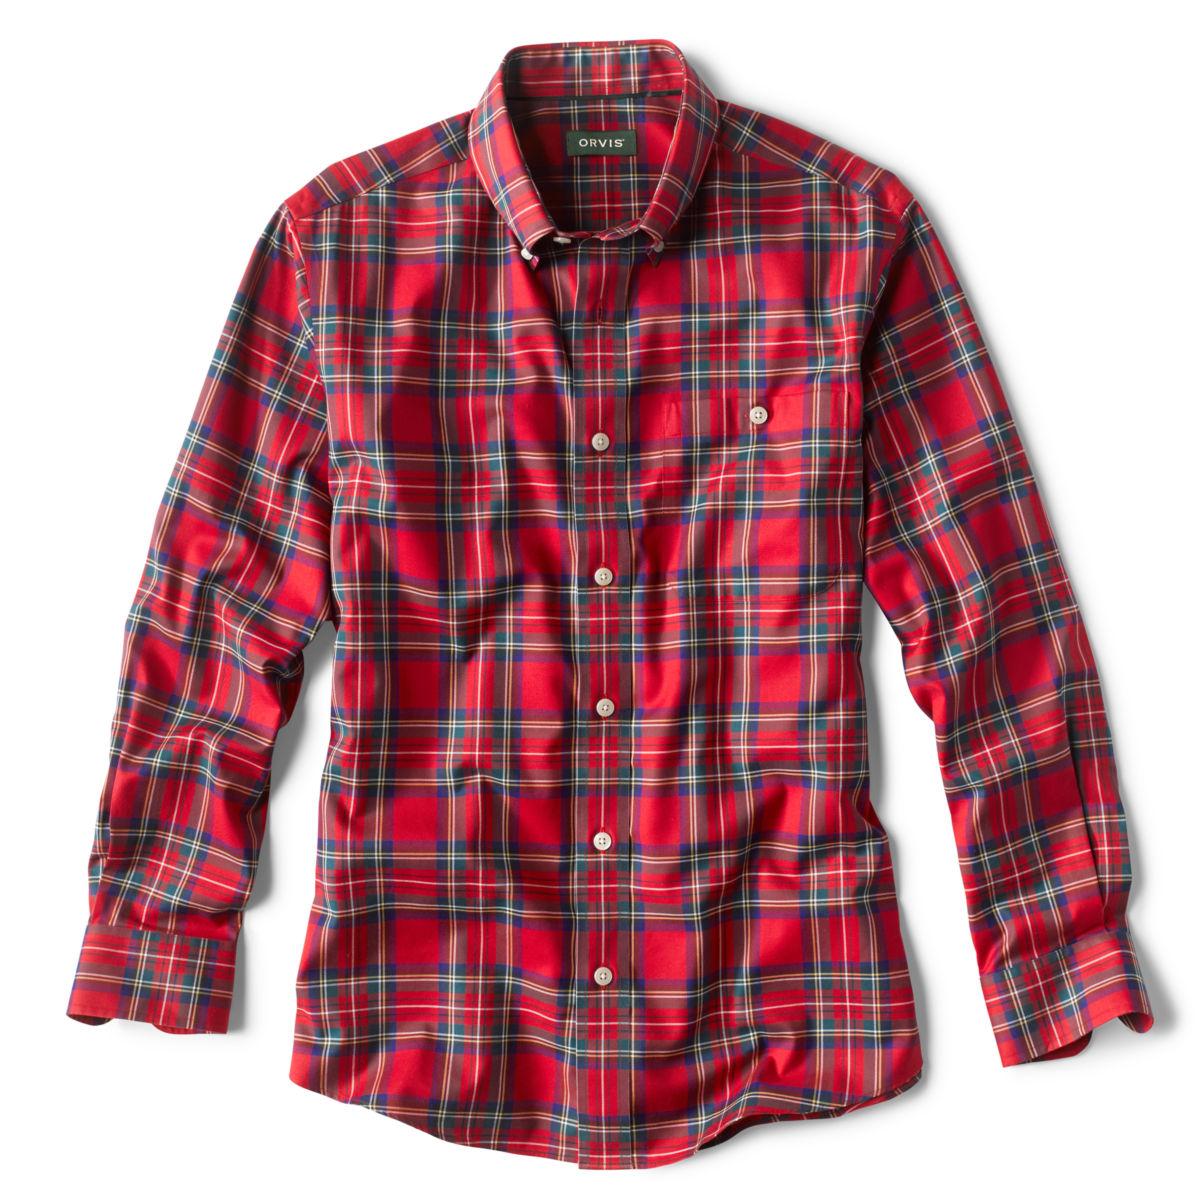 Tartan Wrinkle-Free Comfort Stretch Long-Sleeved Shirt - ROYAL STEWARTimage number 0